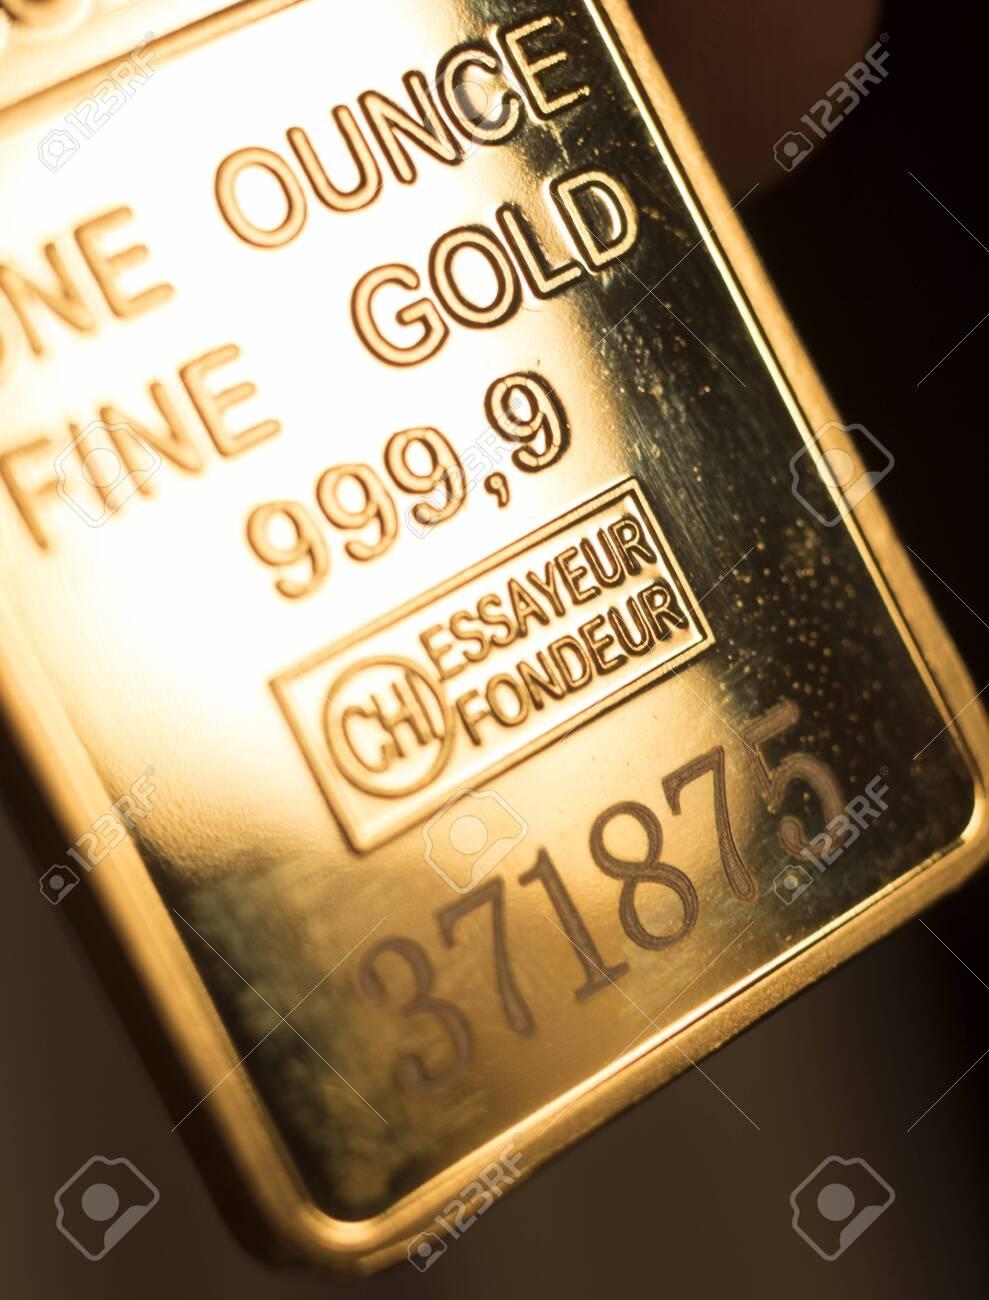 Fine solid gold 999.9 one ounce bullion ingot precious metals bar closeup isolated photo. - 125065924